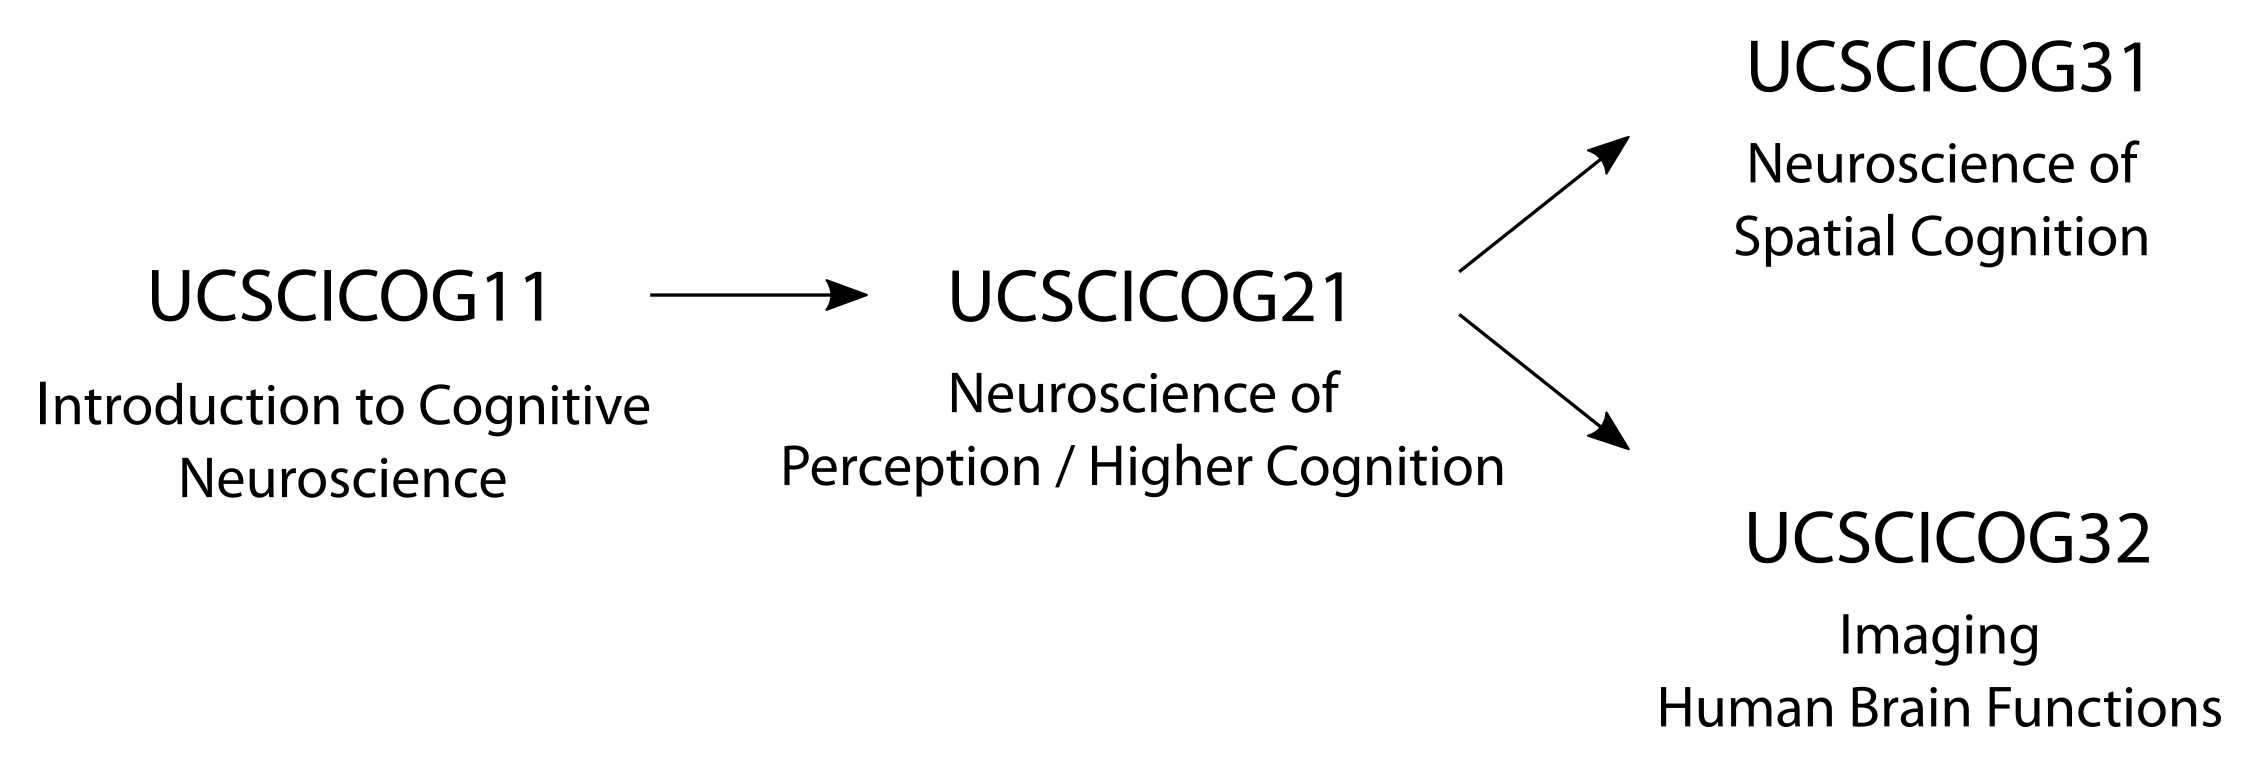 Cognitive Neuroscience - University College Utrecht